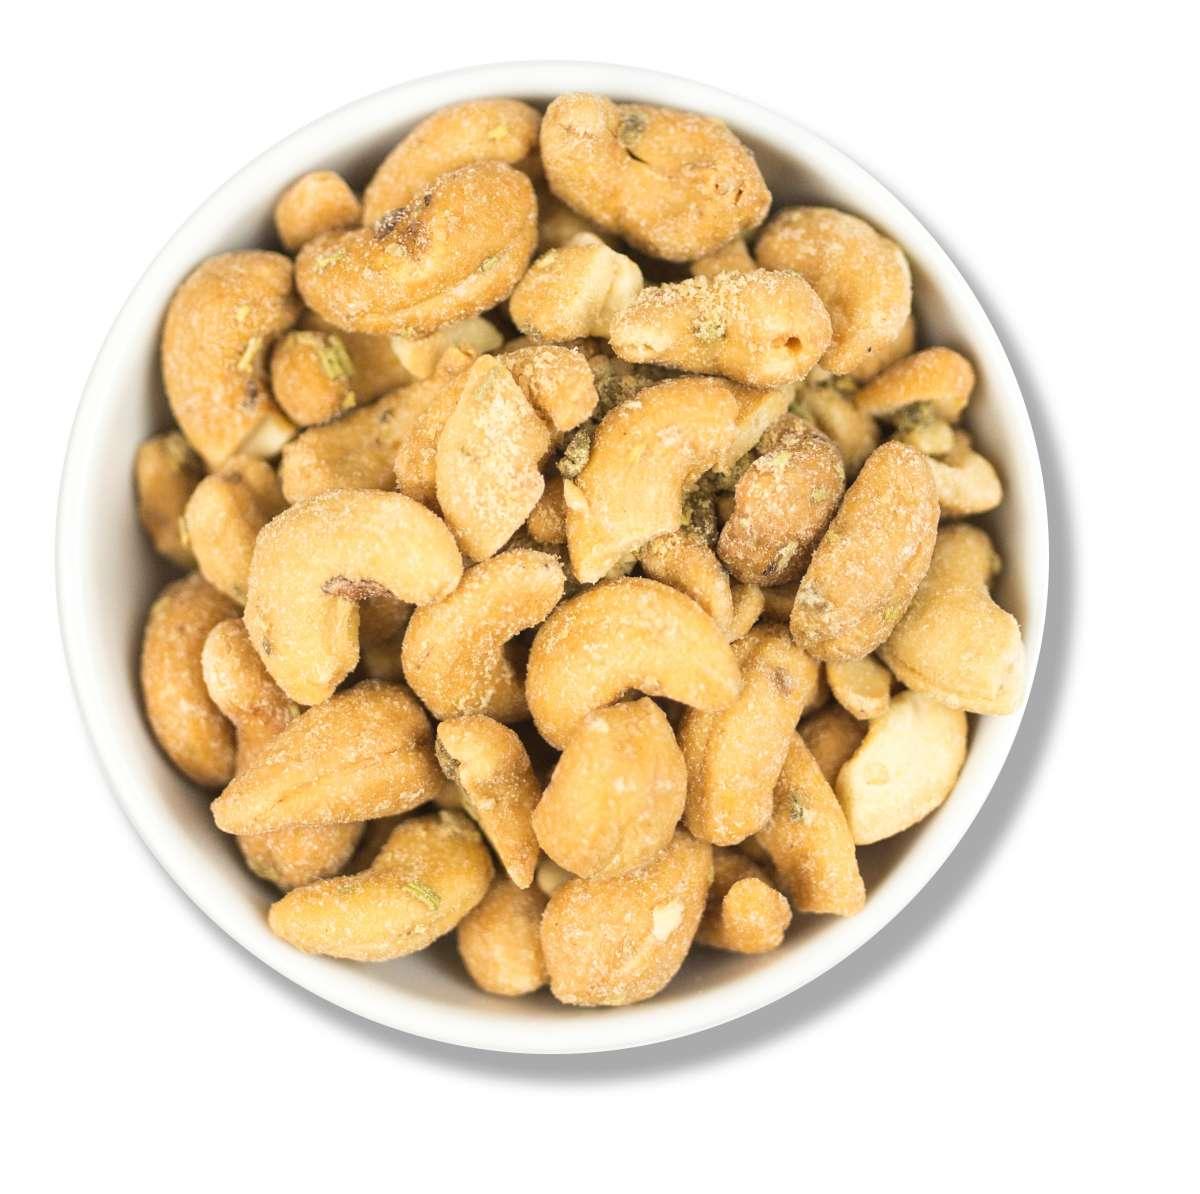 Cashewkerne mit calabria Oliven   Cashewkerne